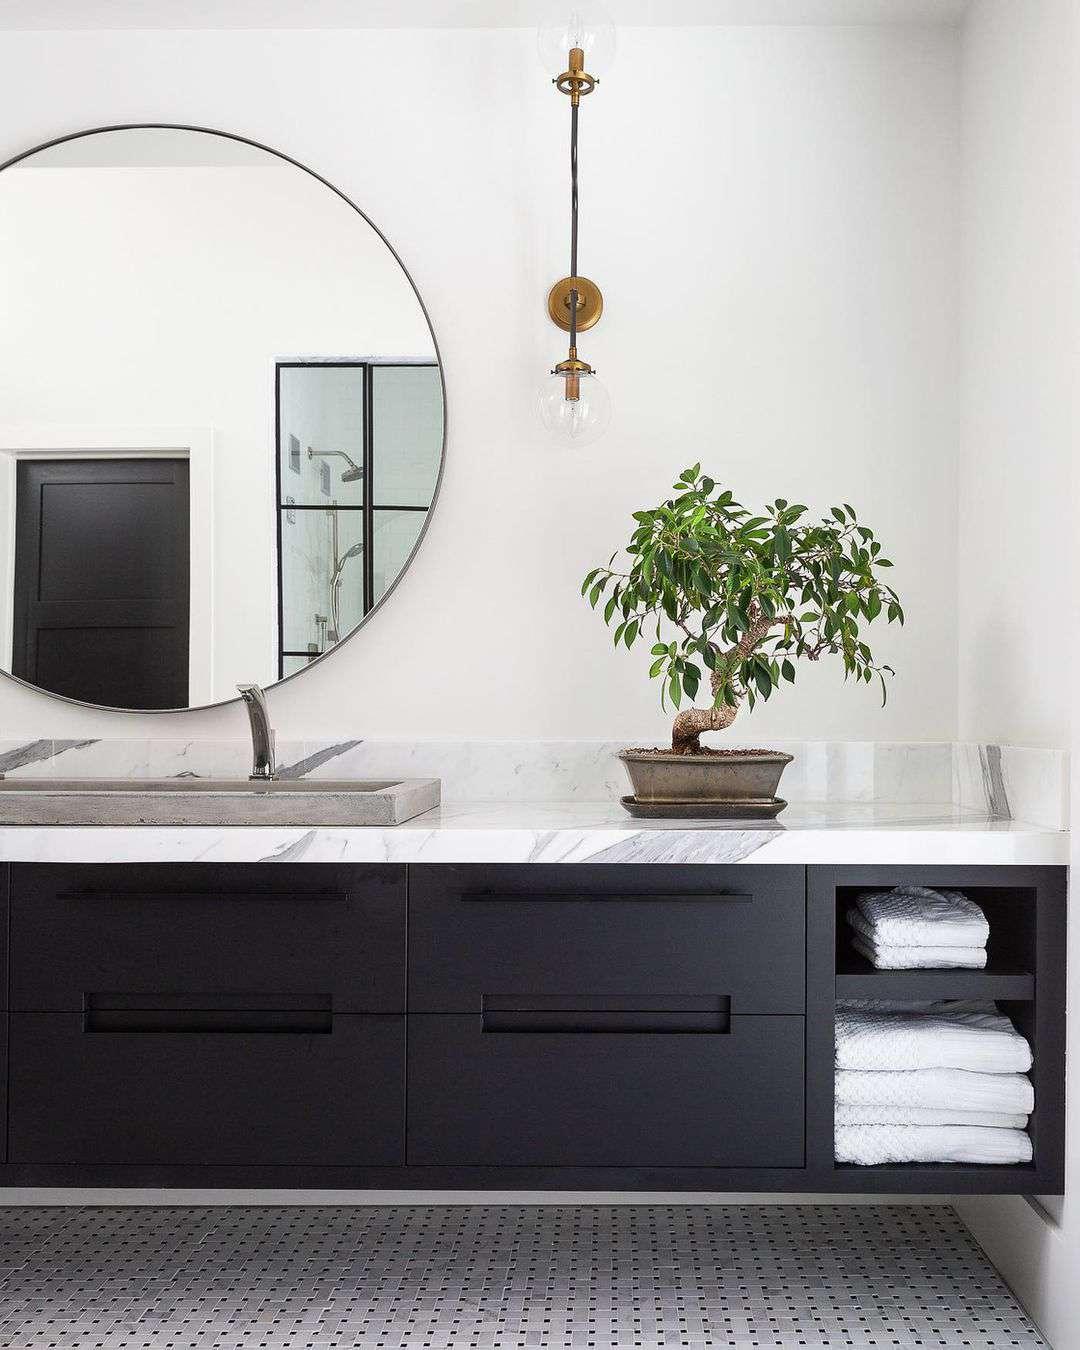 Bonsai on bathroom counter